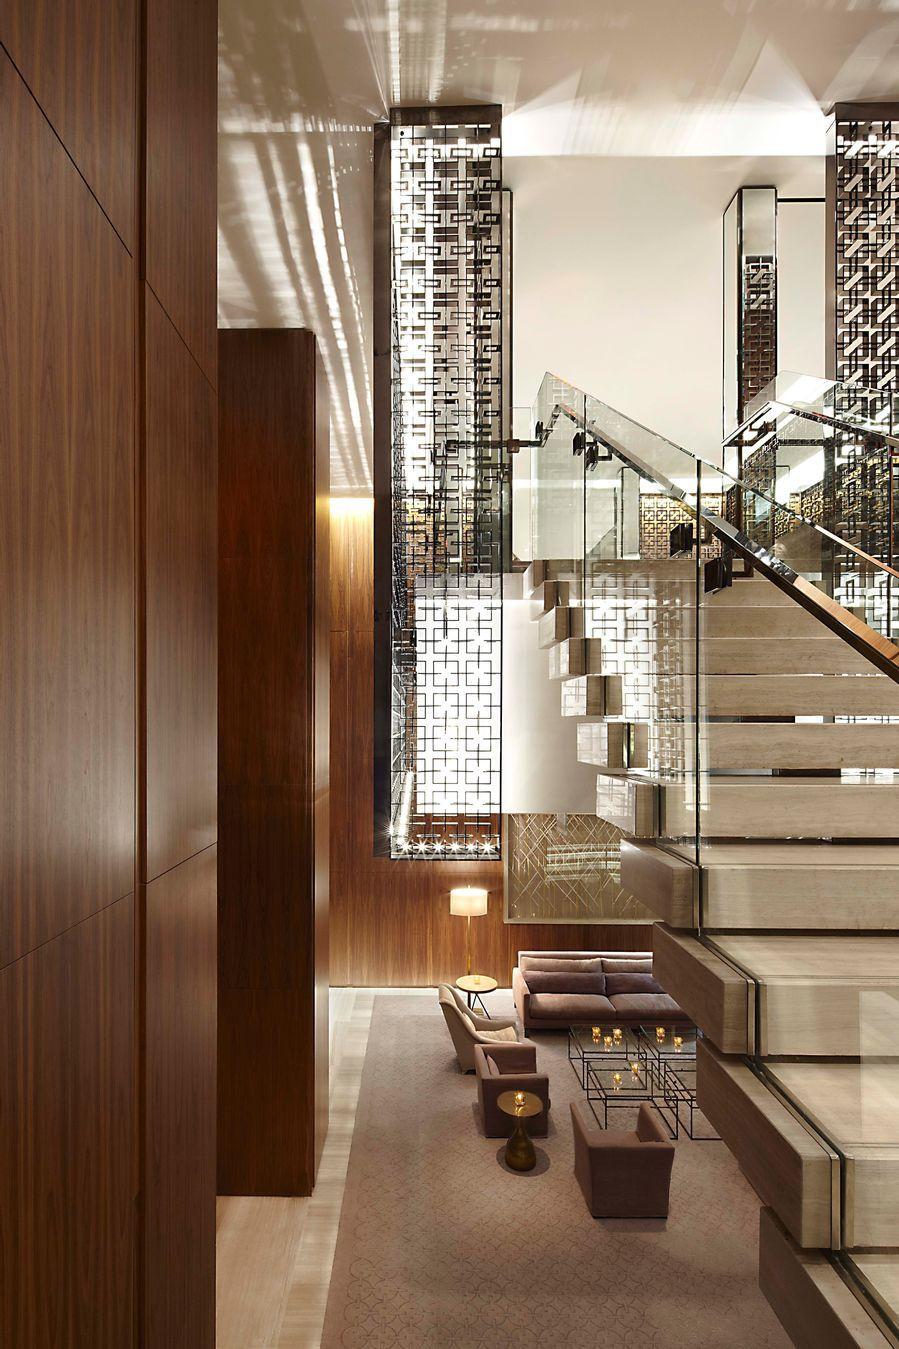 Four seasons hotel toronto designed by yabu pushelberg interior staircase staircase design interior